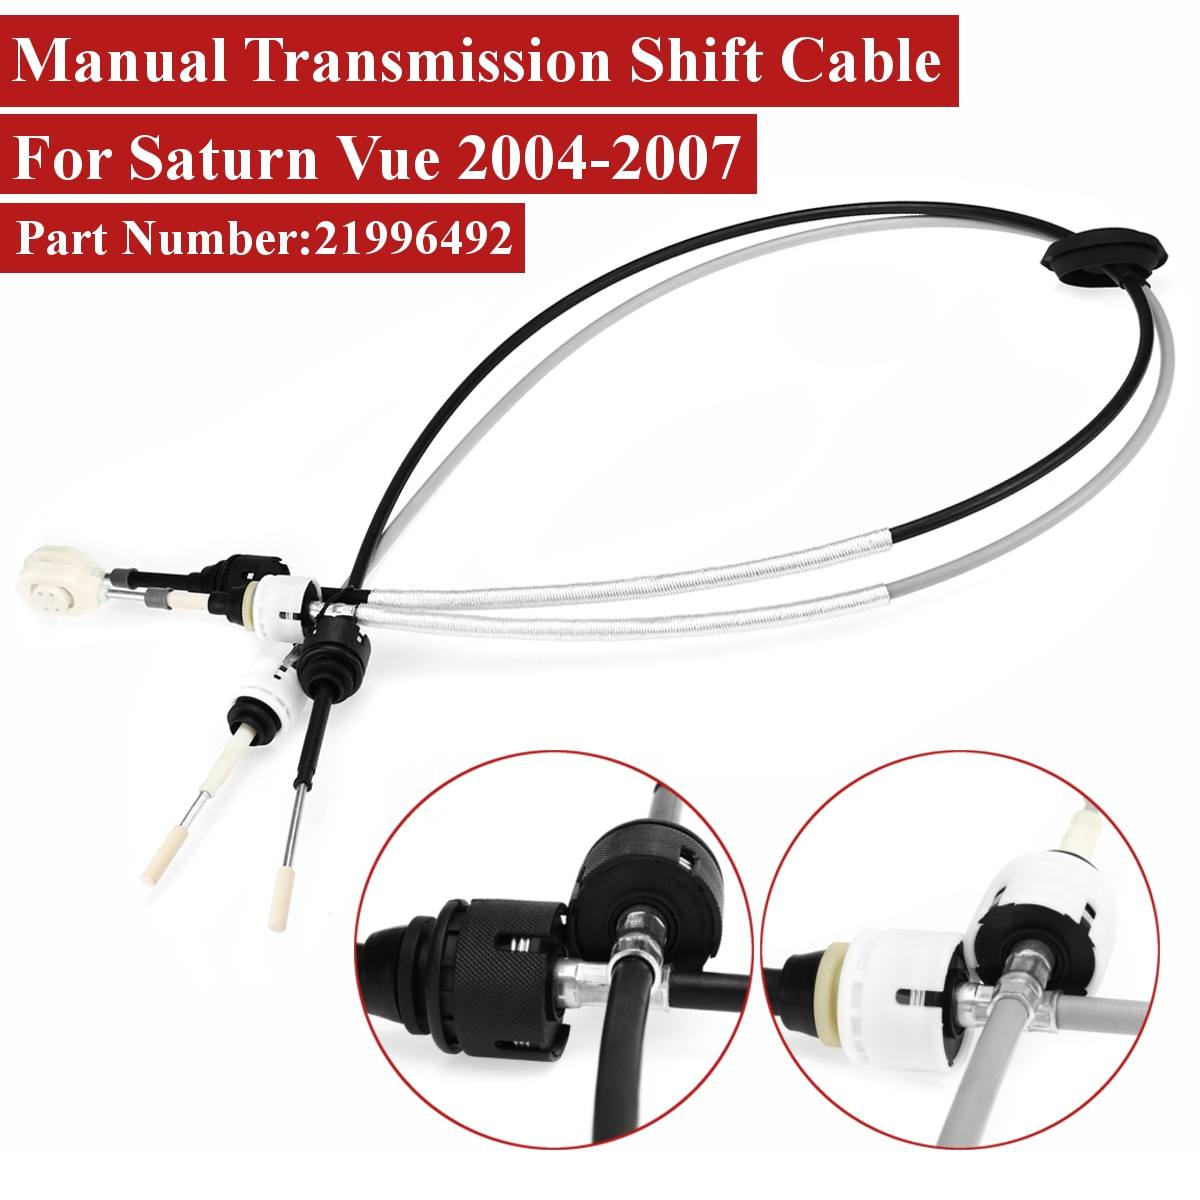 saturn transmission parts diagram 21996492 manual transmission shift cable for saturn vue 2004 2005  manual transmission shift cable